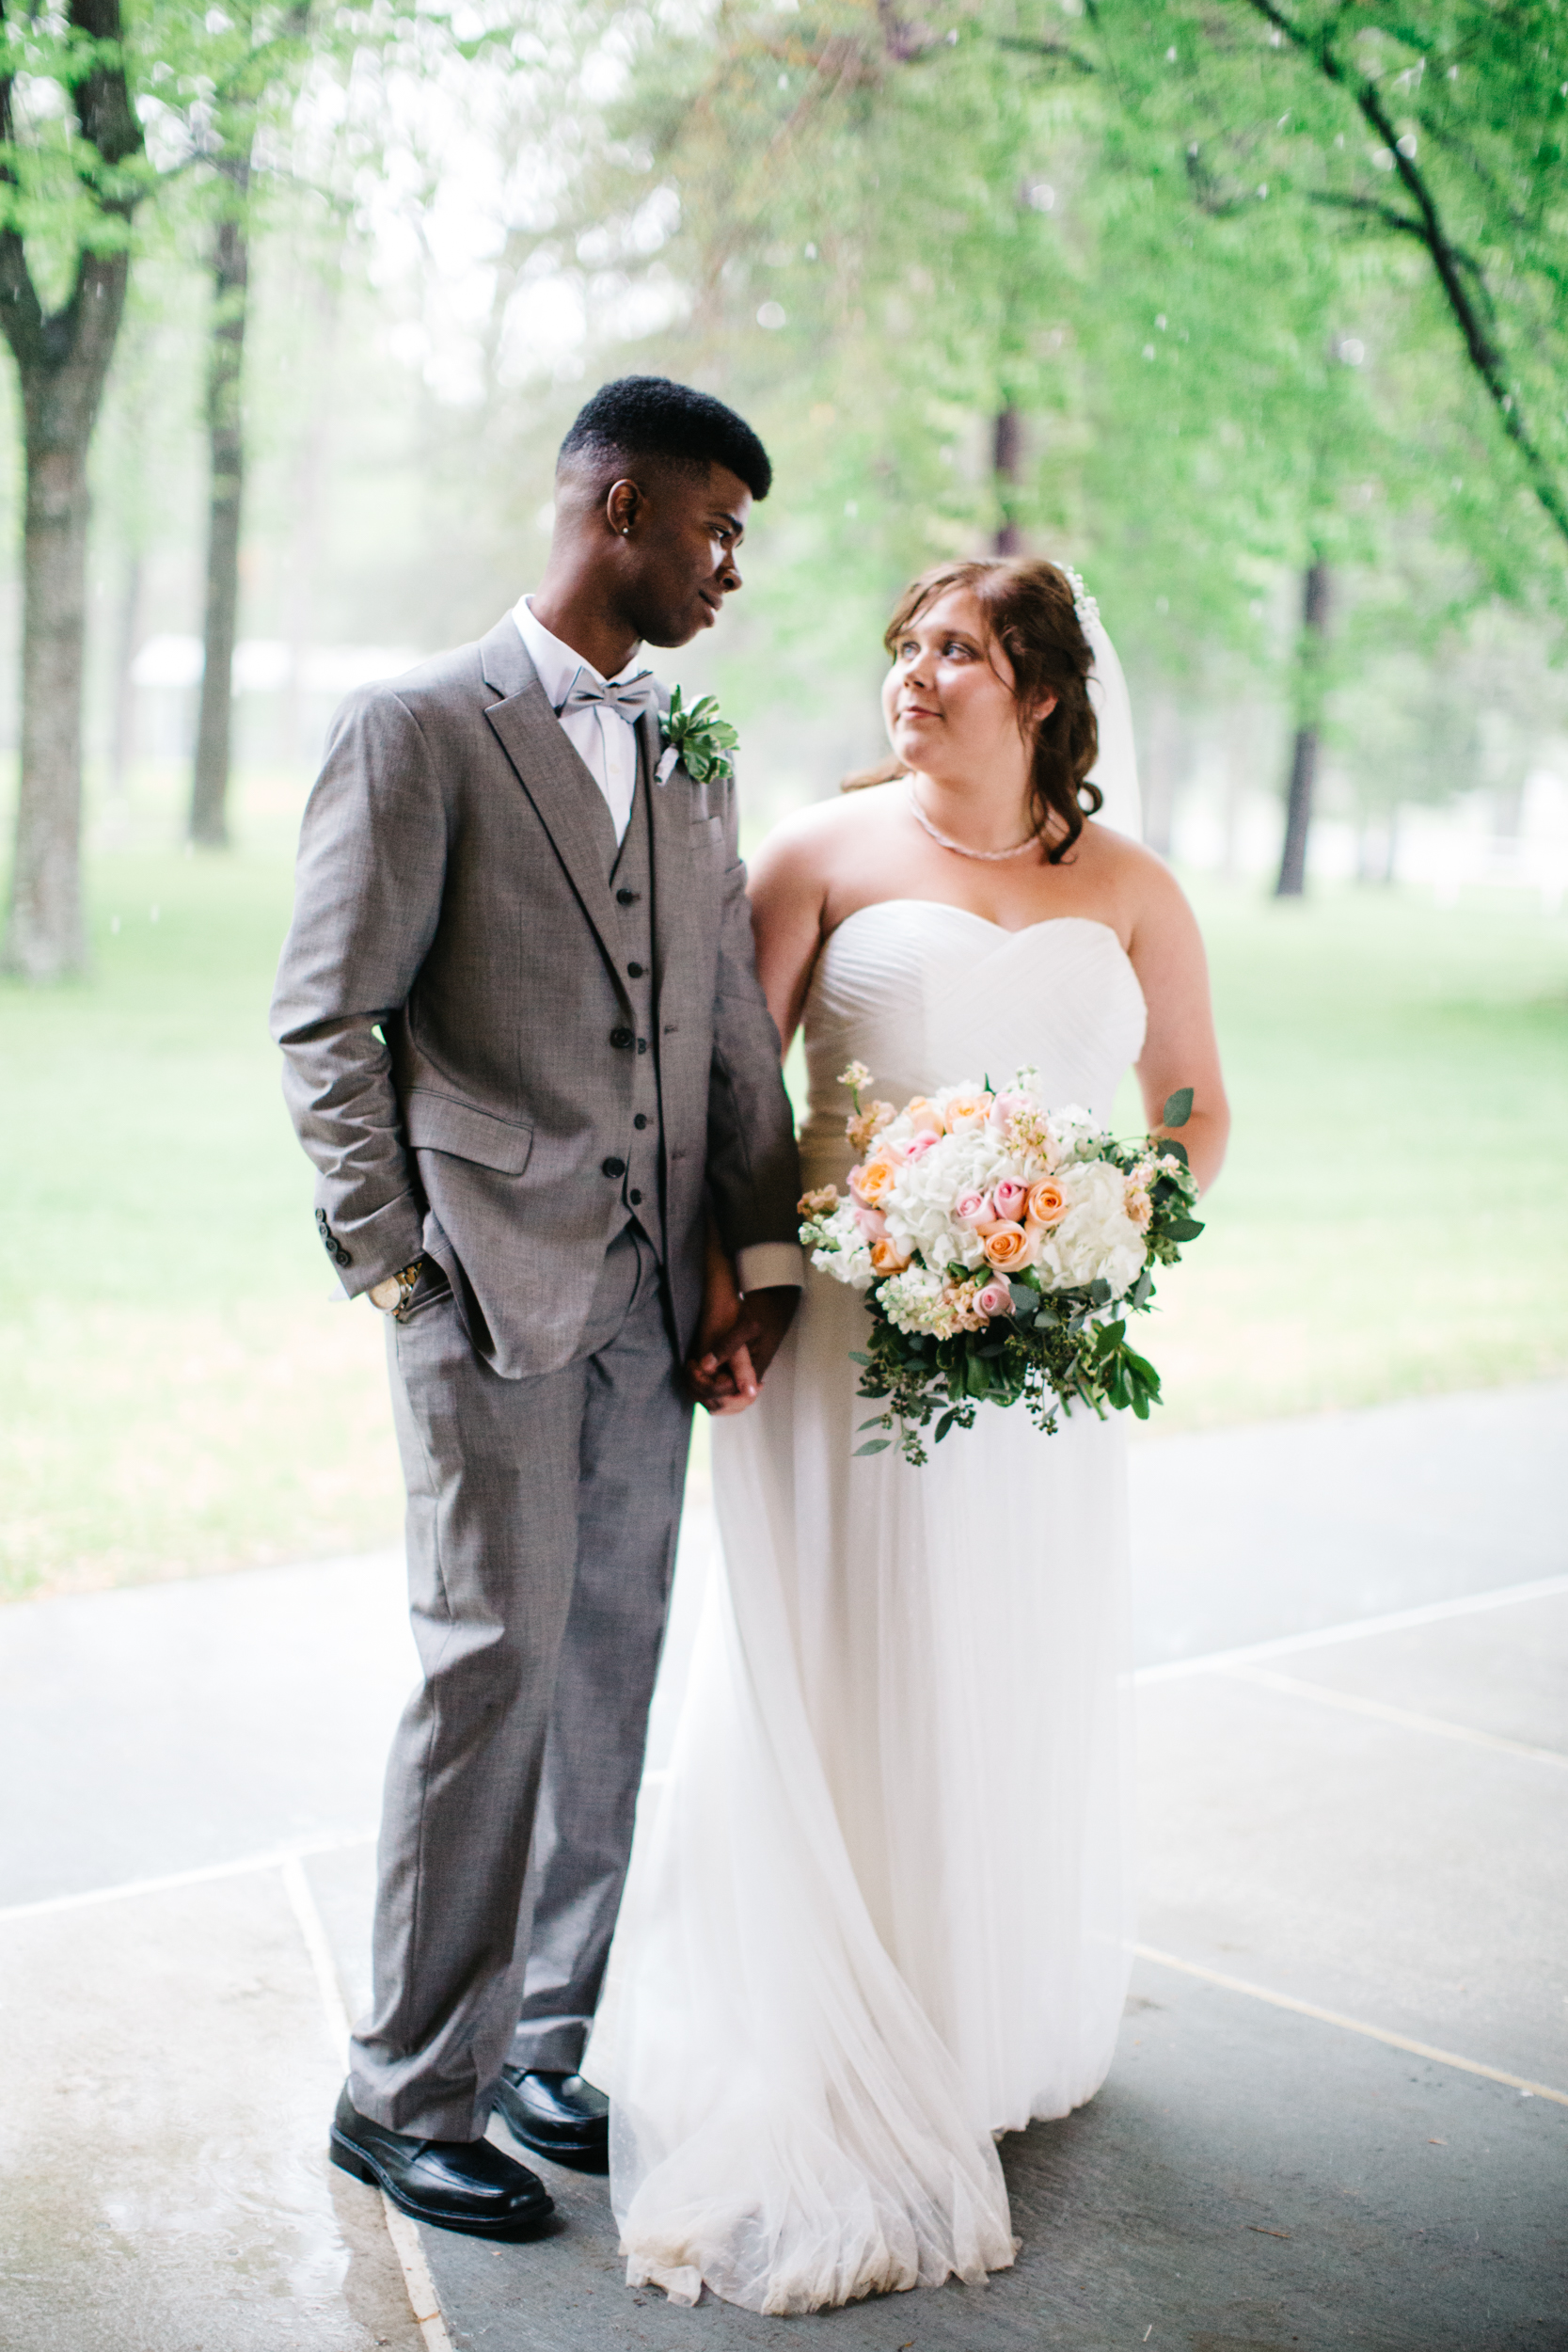 Rainy Day Intimate Wedding Photos